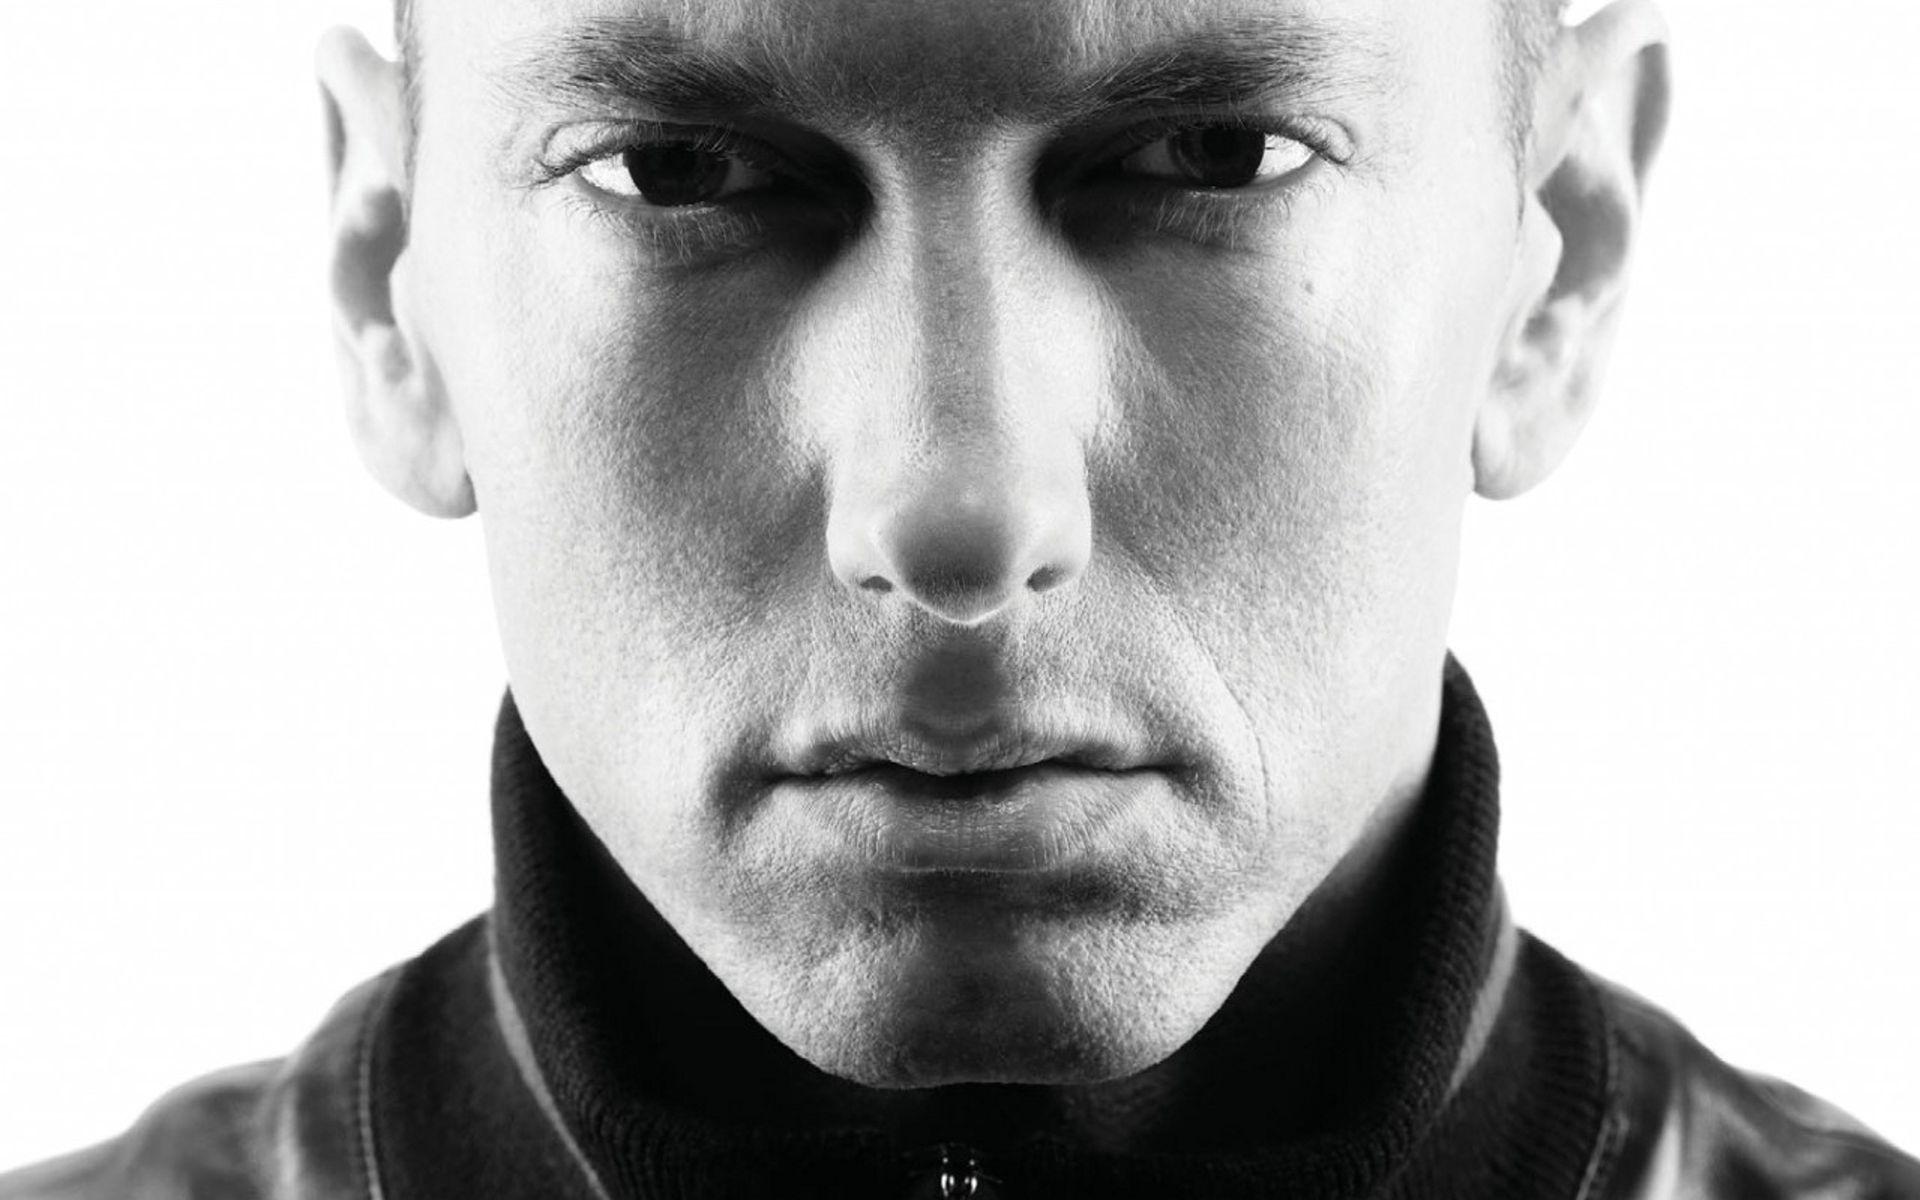 Eminem Pictures and Biography www.Pictures.yt Eminem rap